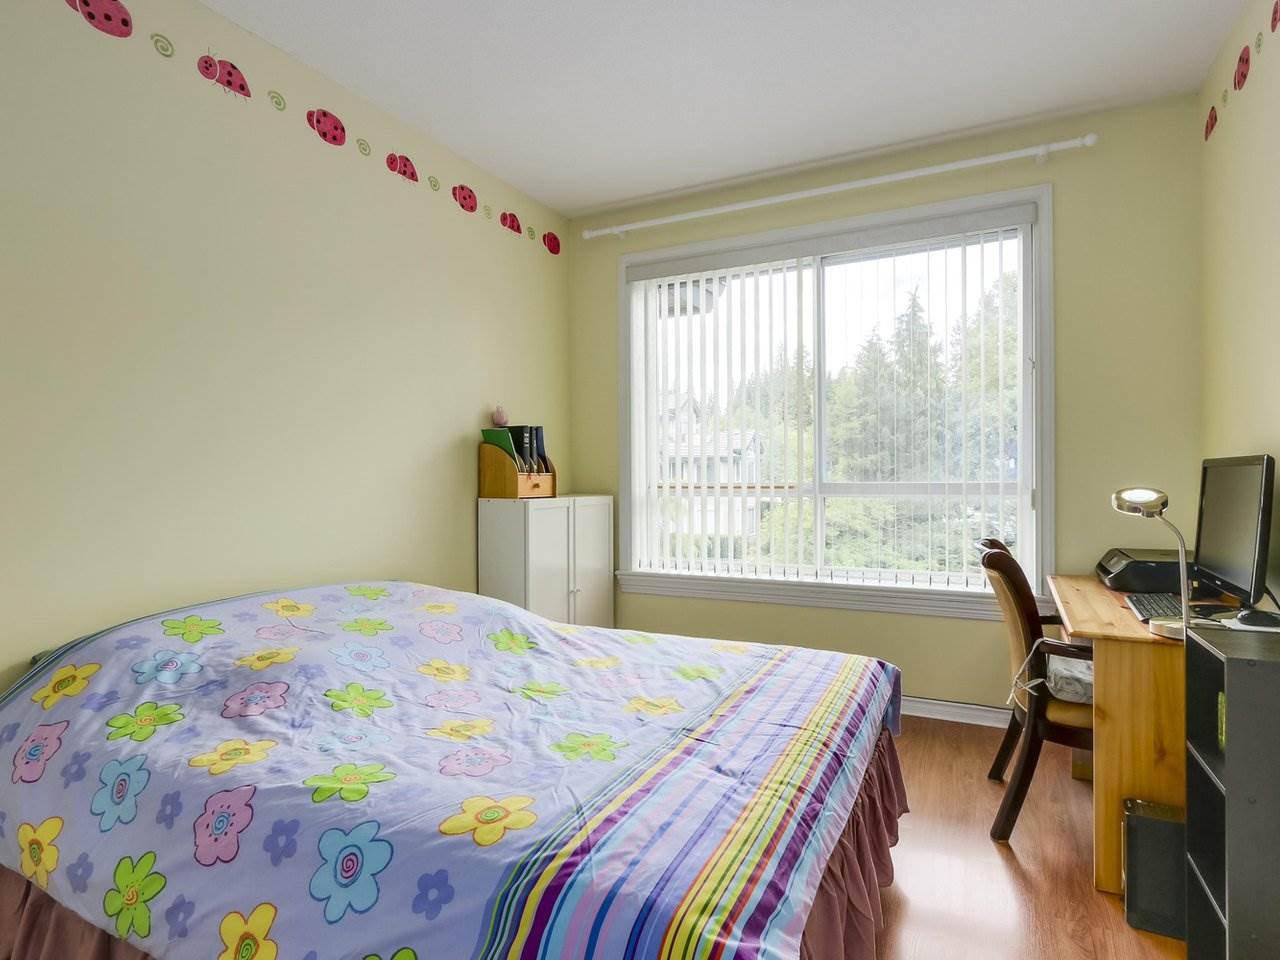 Photo 14: Photos: 303 3280 PLATEAU BOULEVARD in Coquitlam: Westwood Plateau Condo for sale : MLS®# R2275918